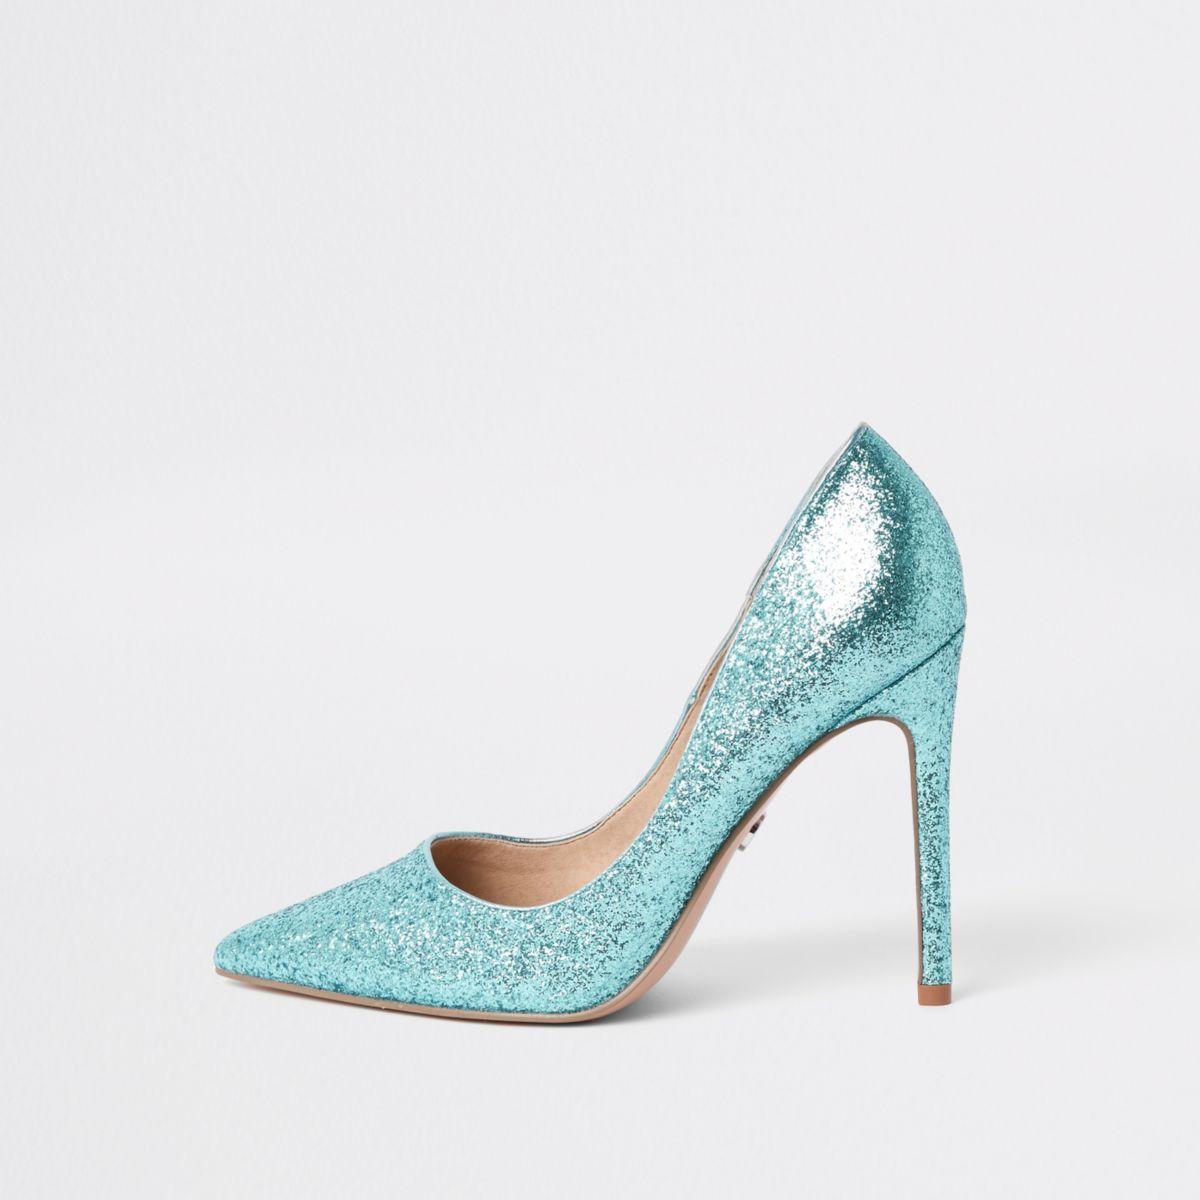 Blue glitter pumps